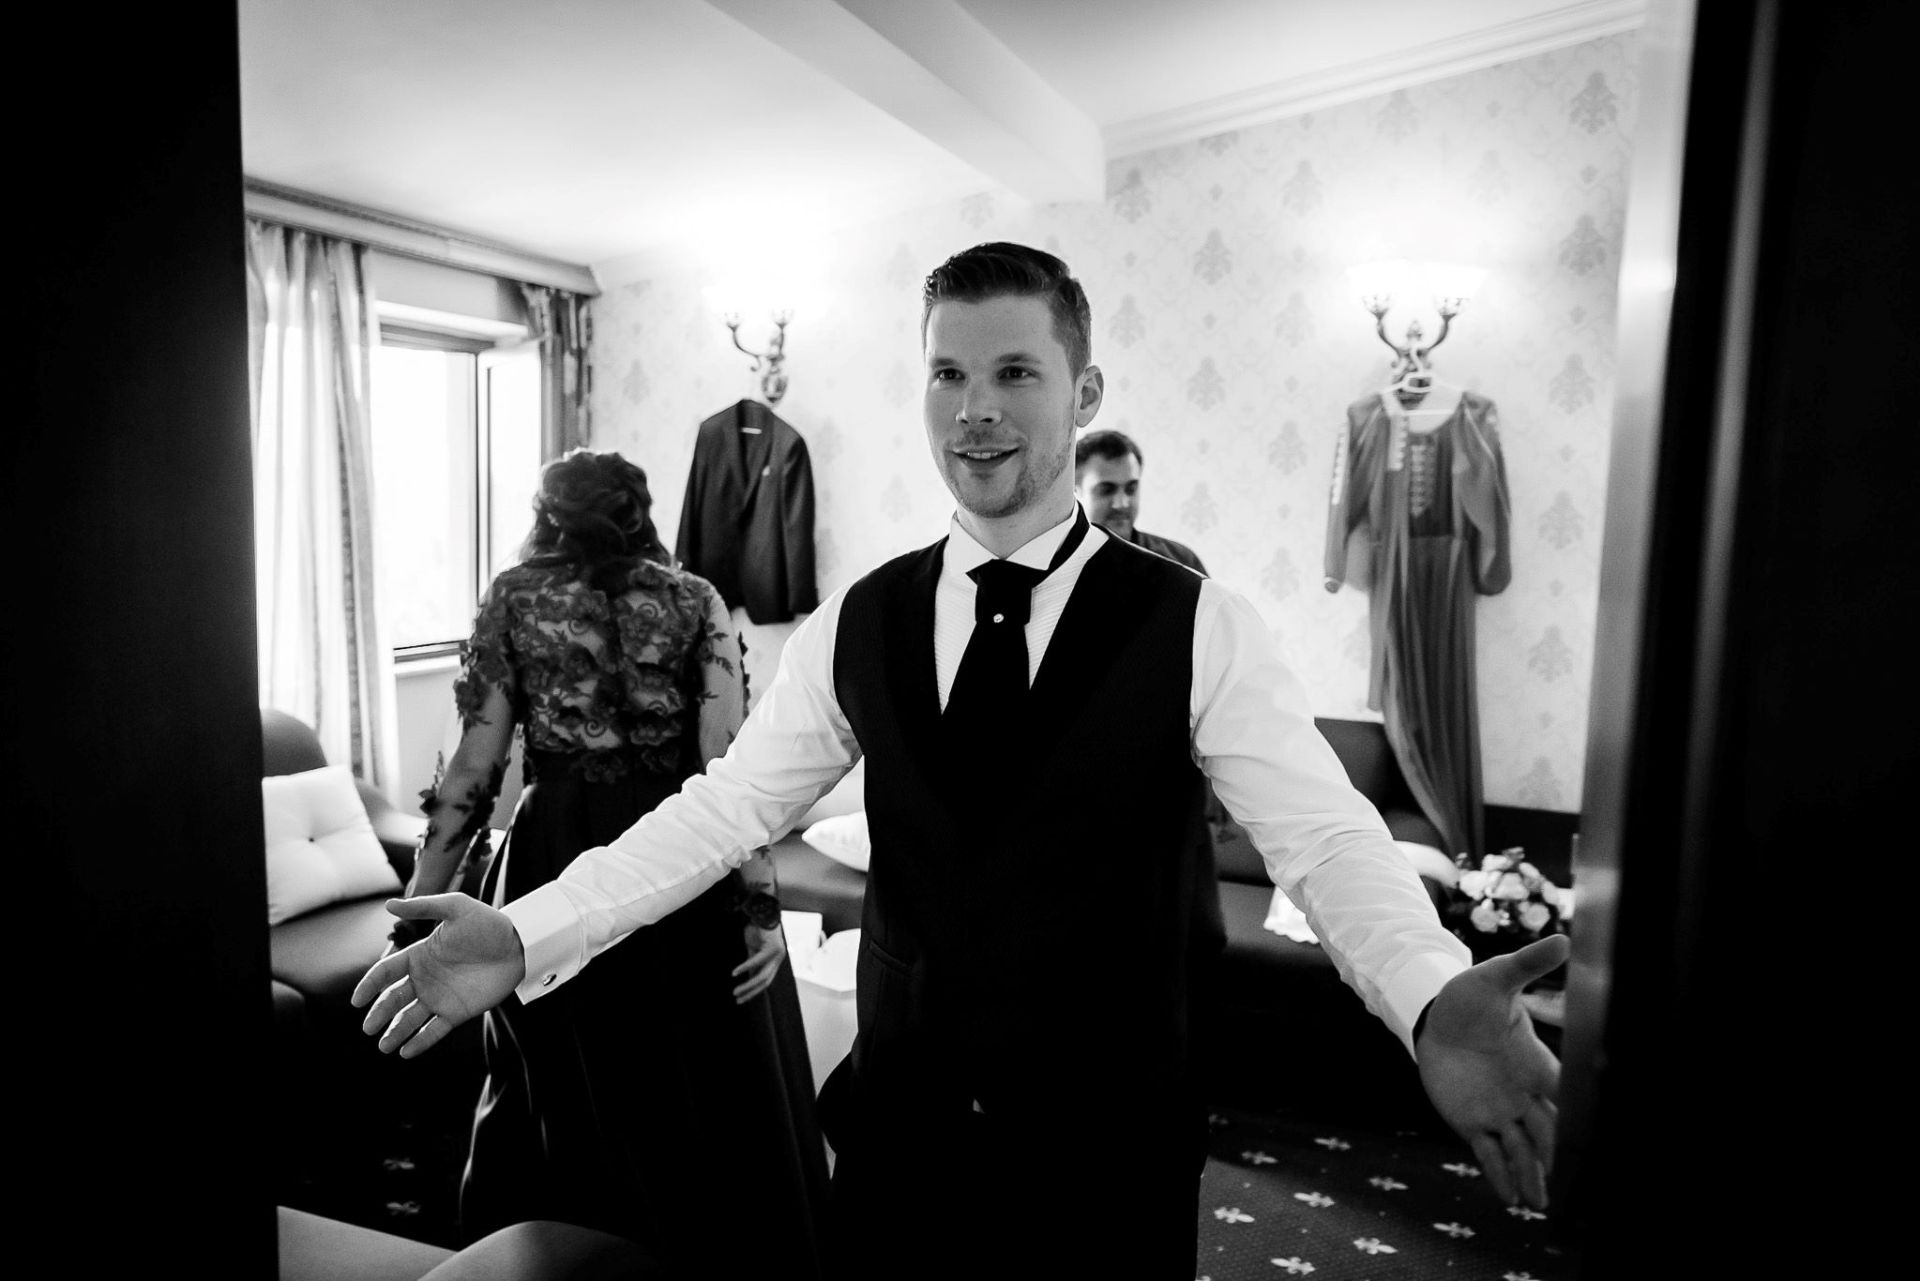 Alex si Natalia nunta Sala Regala La Castel Iasi - fotograf profesionist nunta iasi Paul Padurariu 2019 8